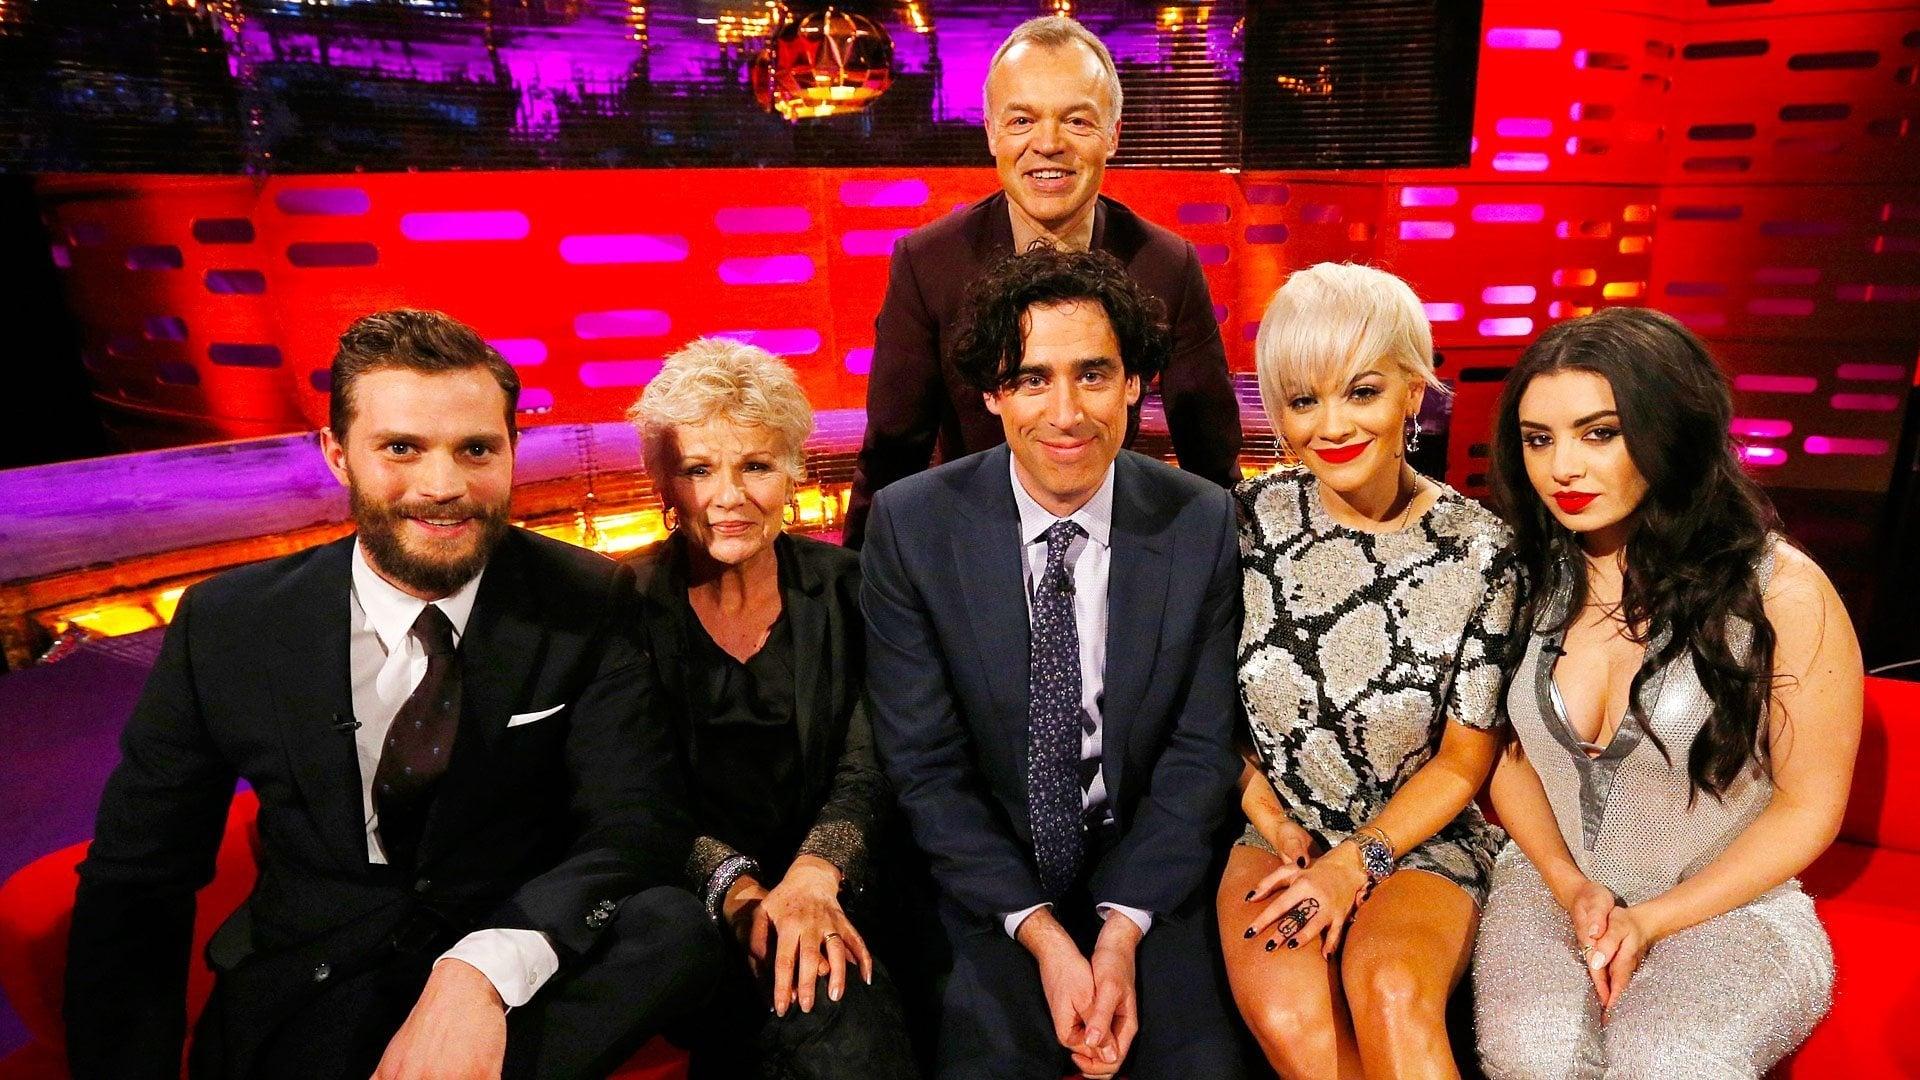 The Graham Norton Show Season 16 :Episode 18  Jamie Dornan, Julie Walters, Stephen Mangan, Charli XCX and Rita Ora